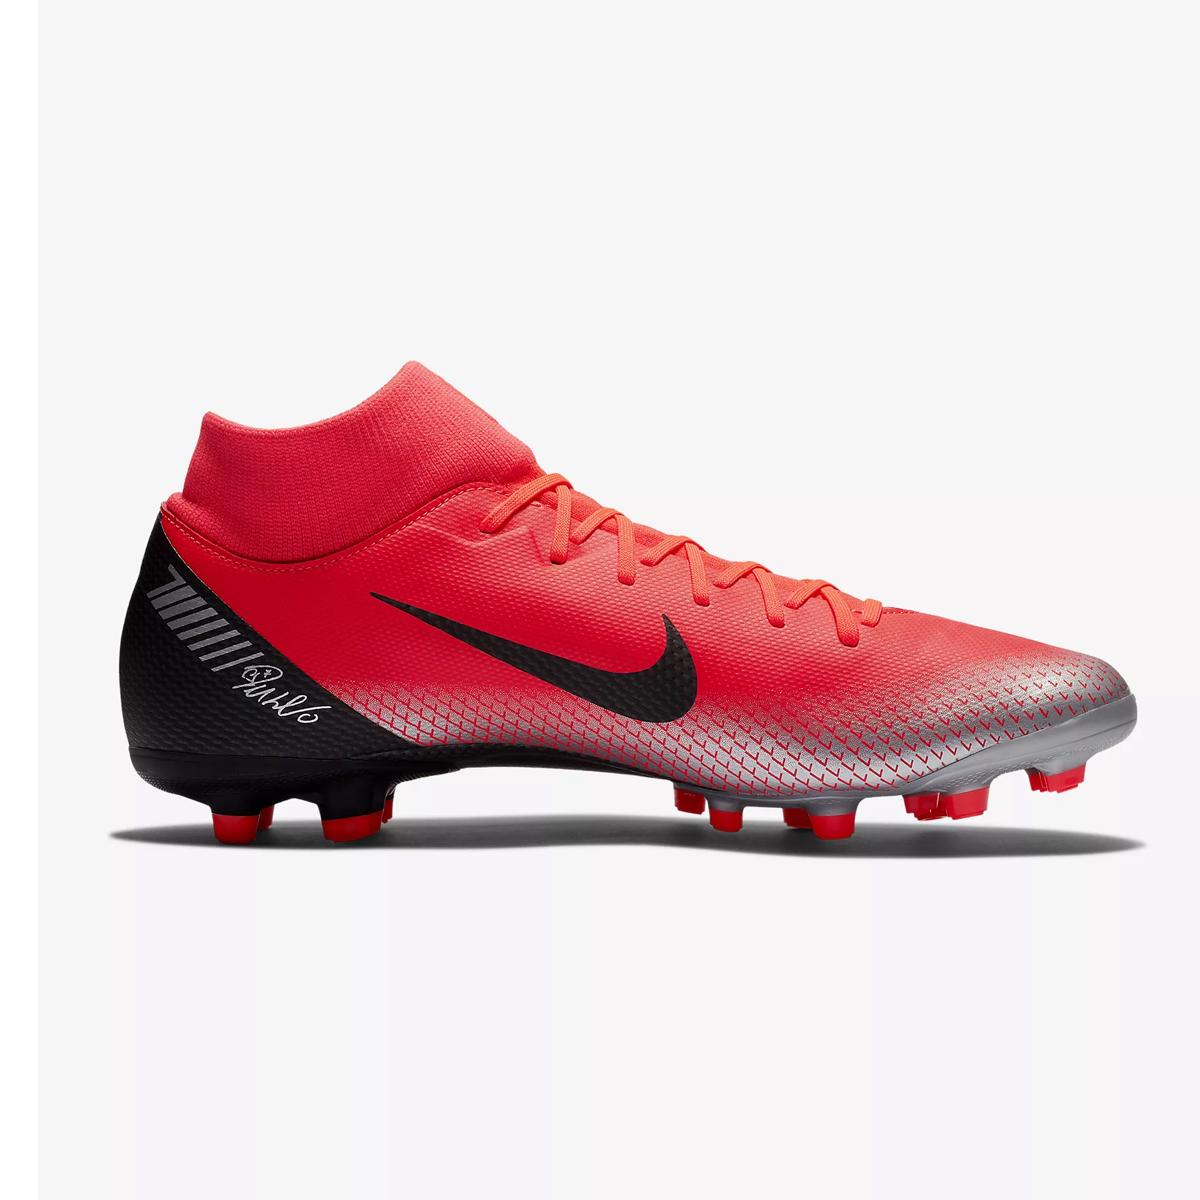 97d4e2355 Nike Mens Mercurial Superfly 6 Academy CR7 Multi Ground Football Boot  Bright Crimson